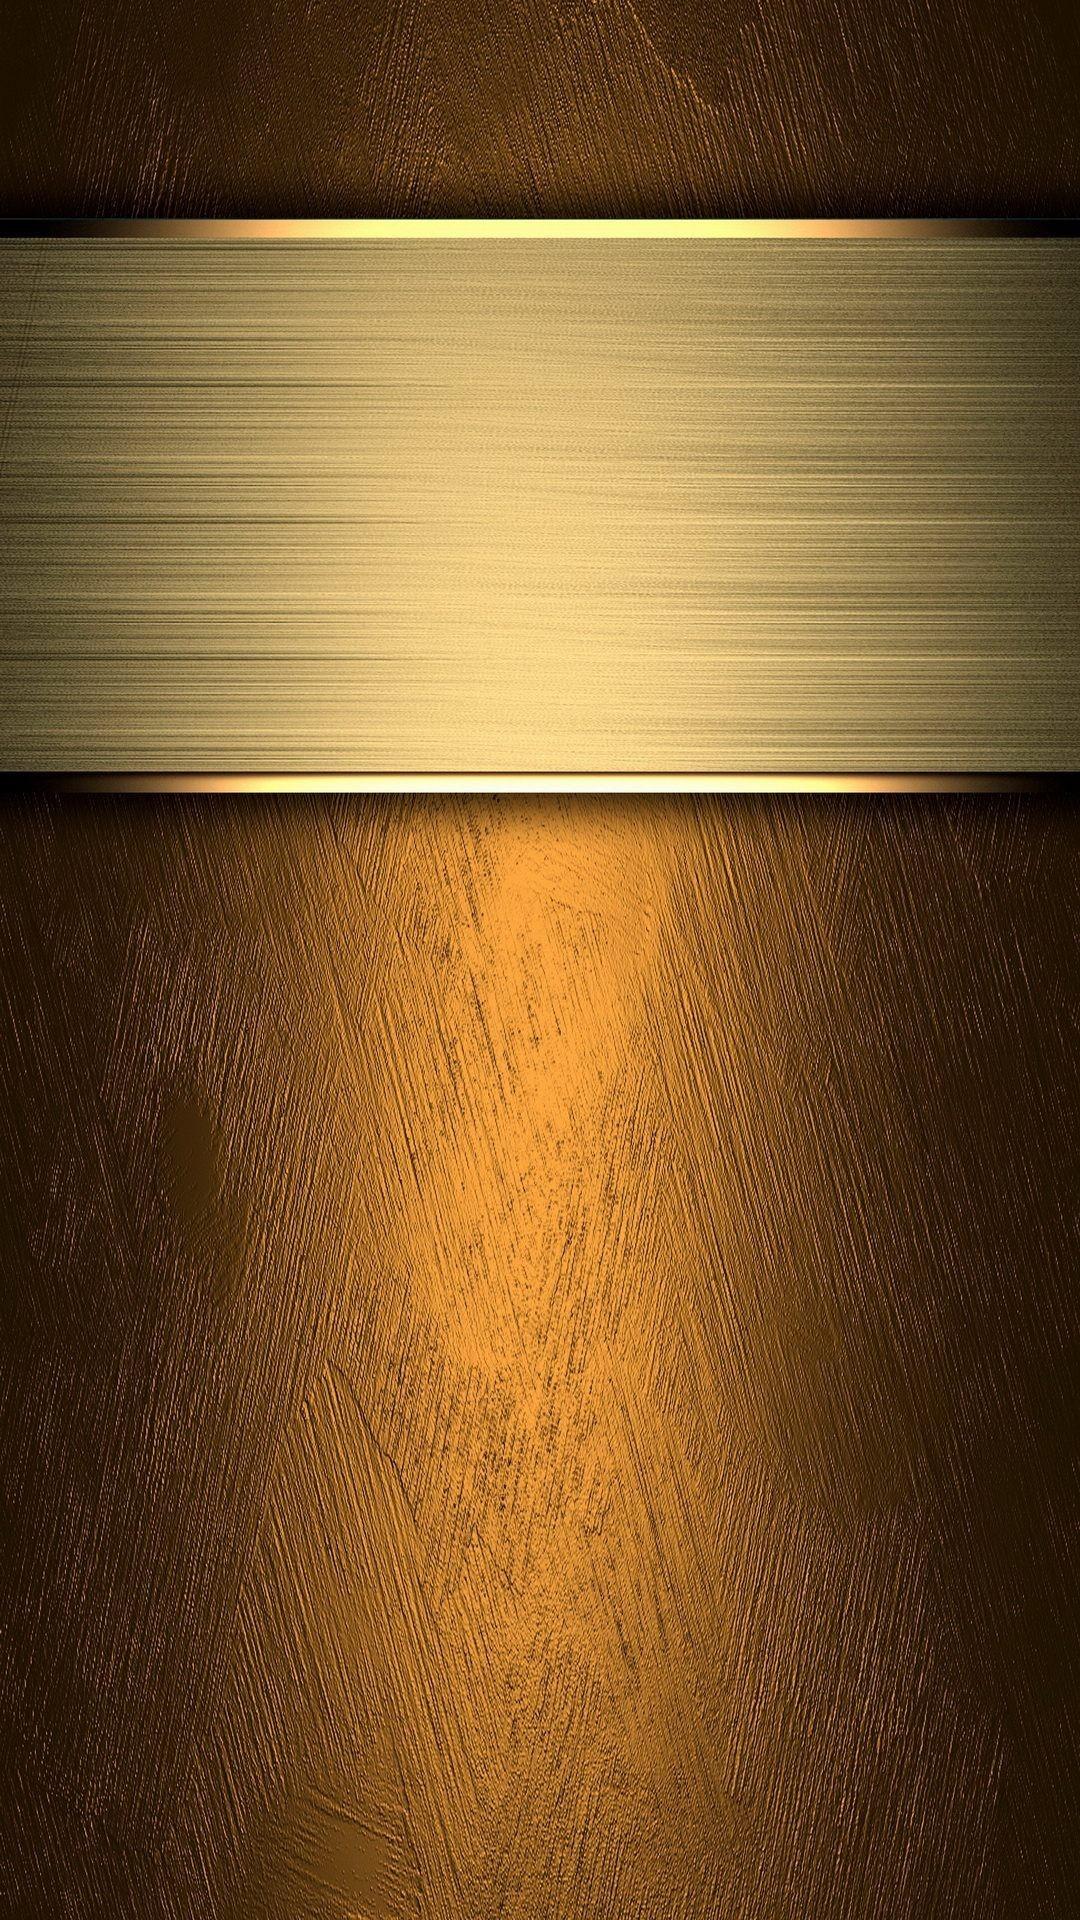 Gold | iPhone Wallpaper